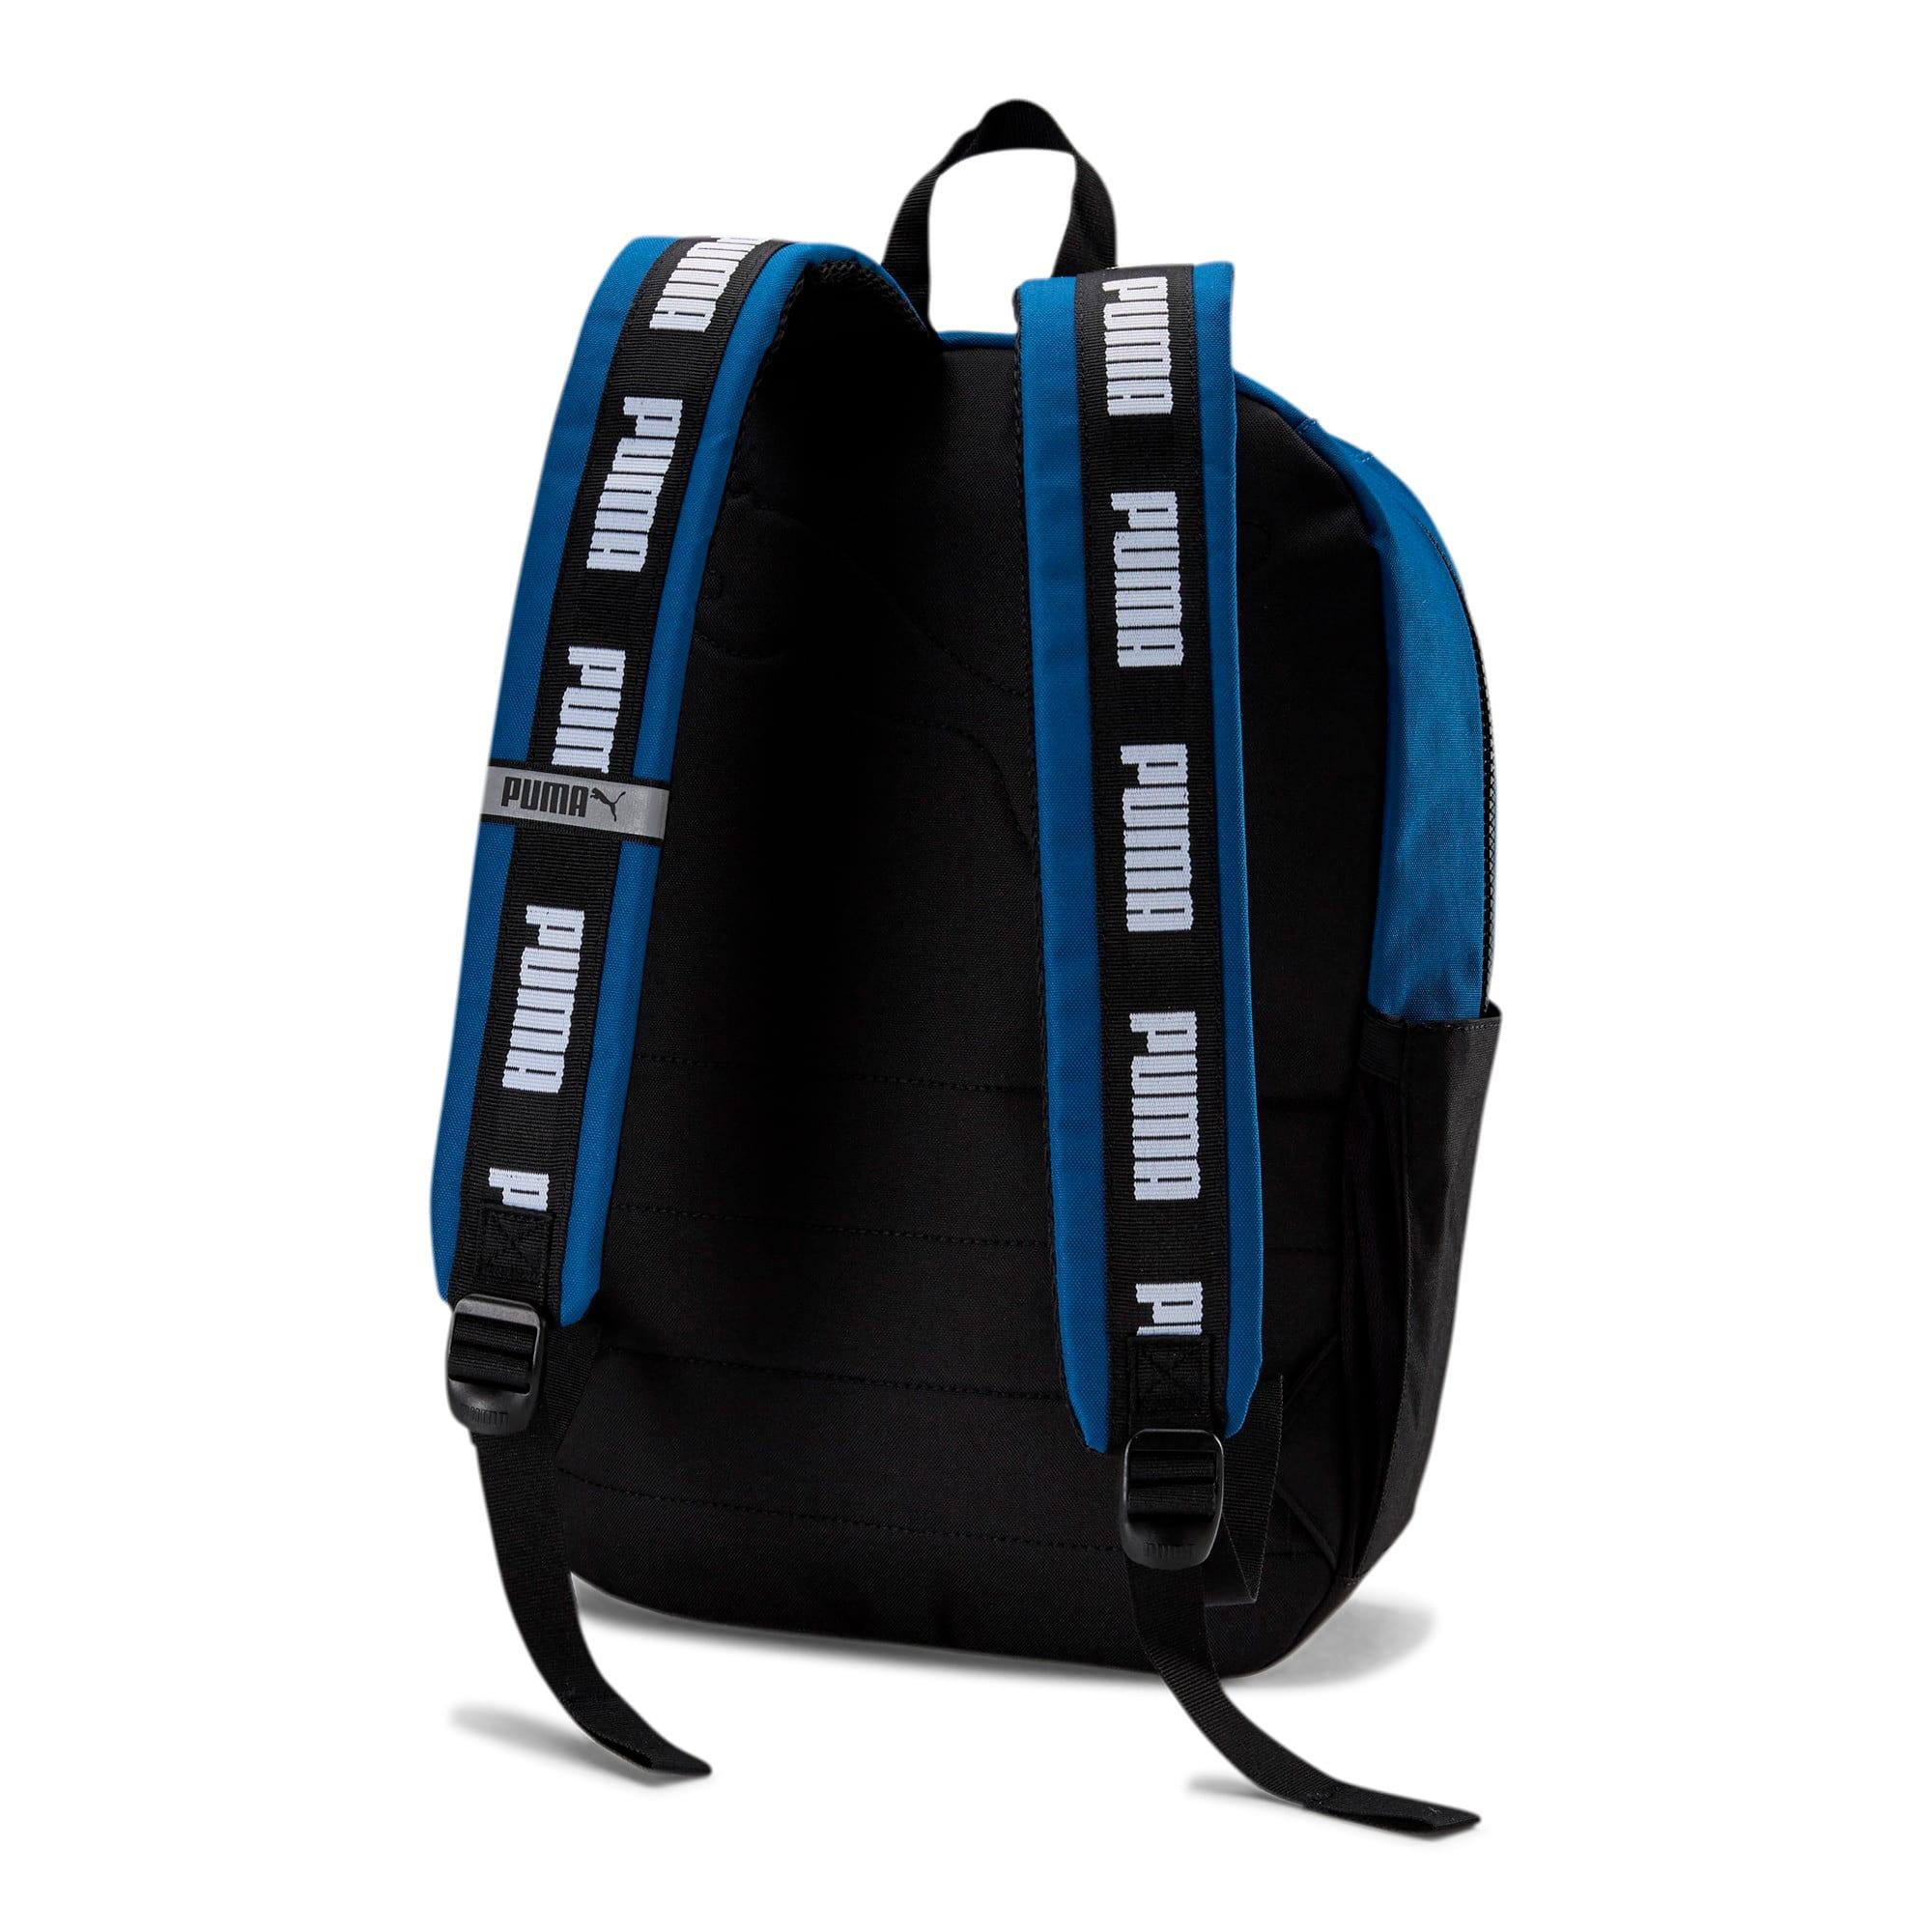 Thumbnail 2 of Streak Backpack, Blue Combo, medium